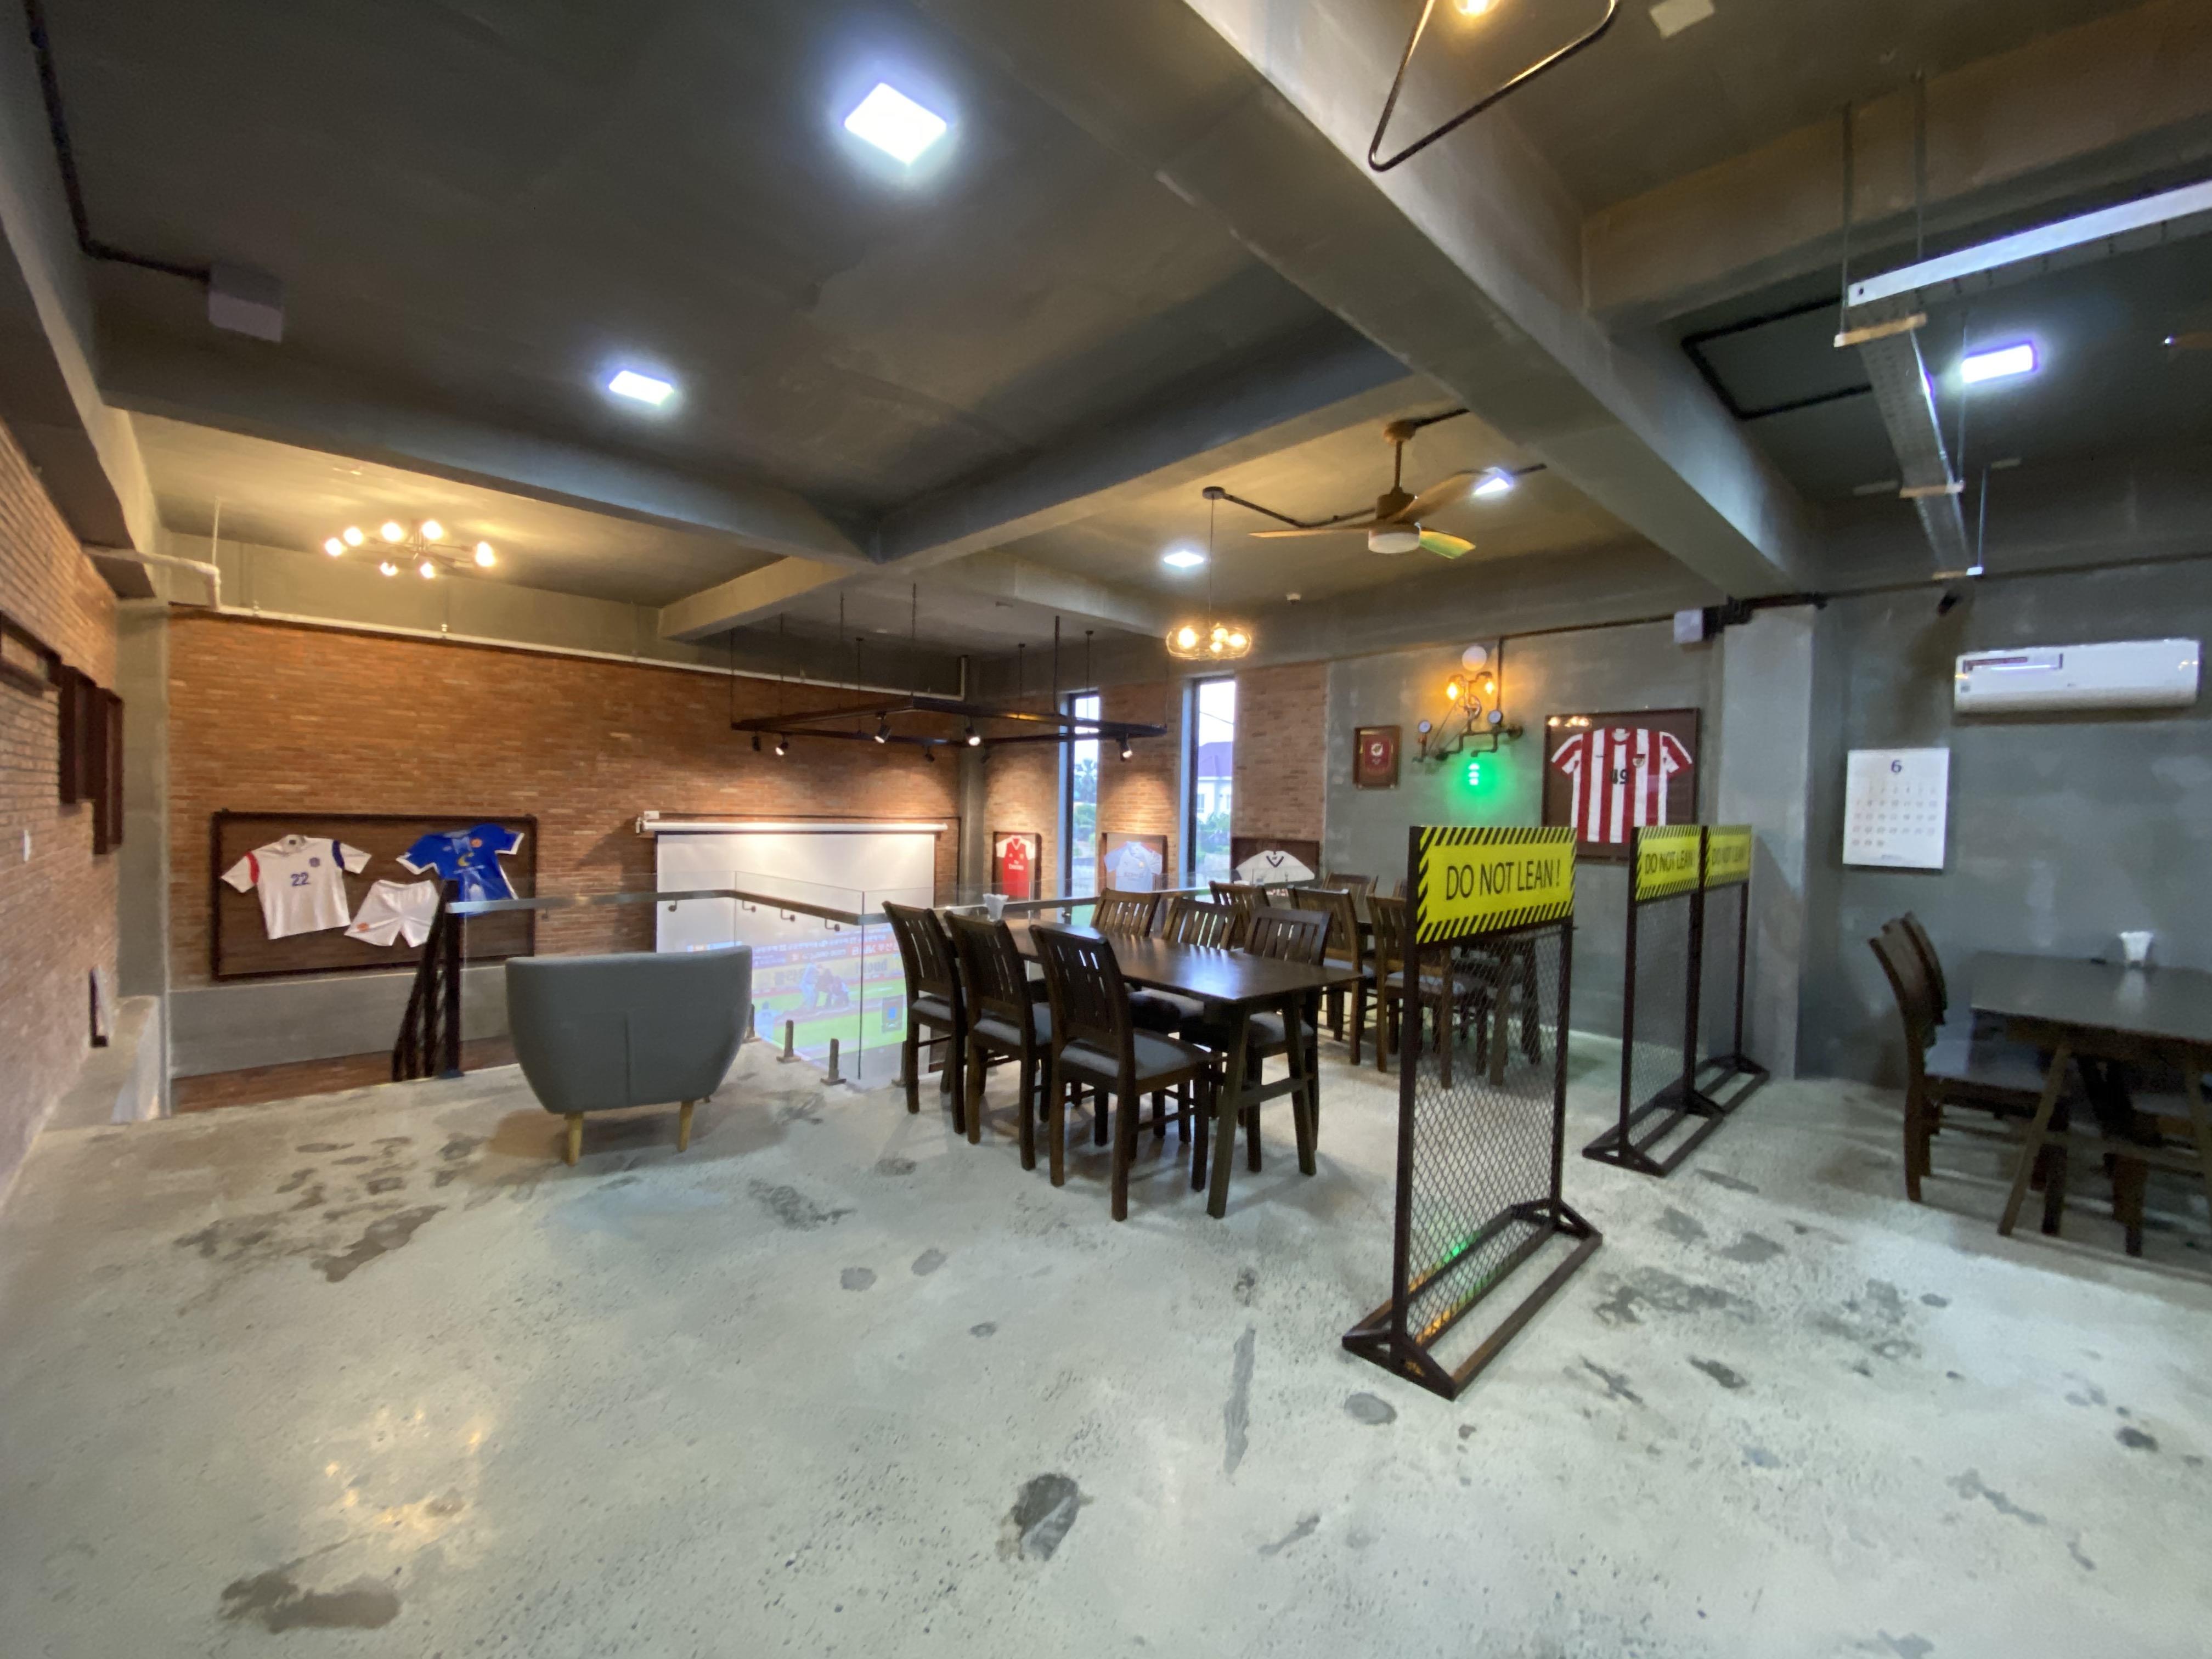 SKYBOX Restopub